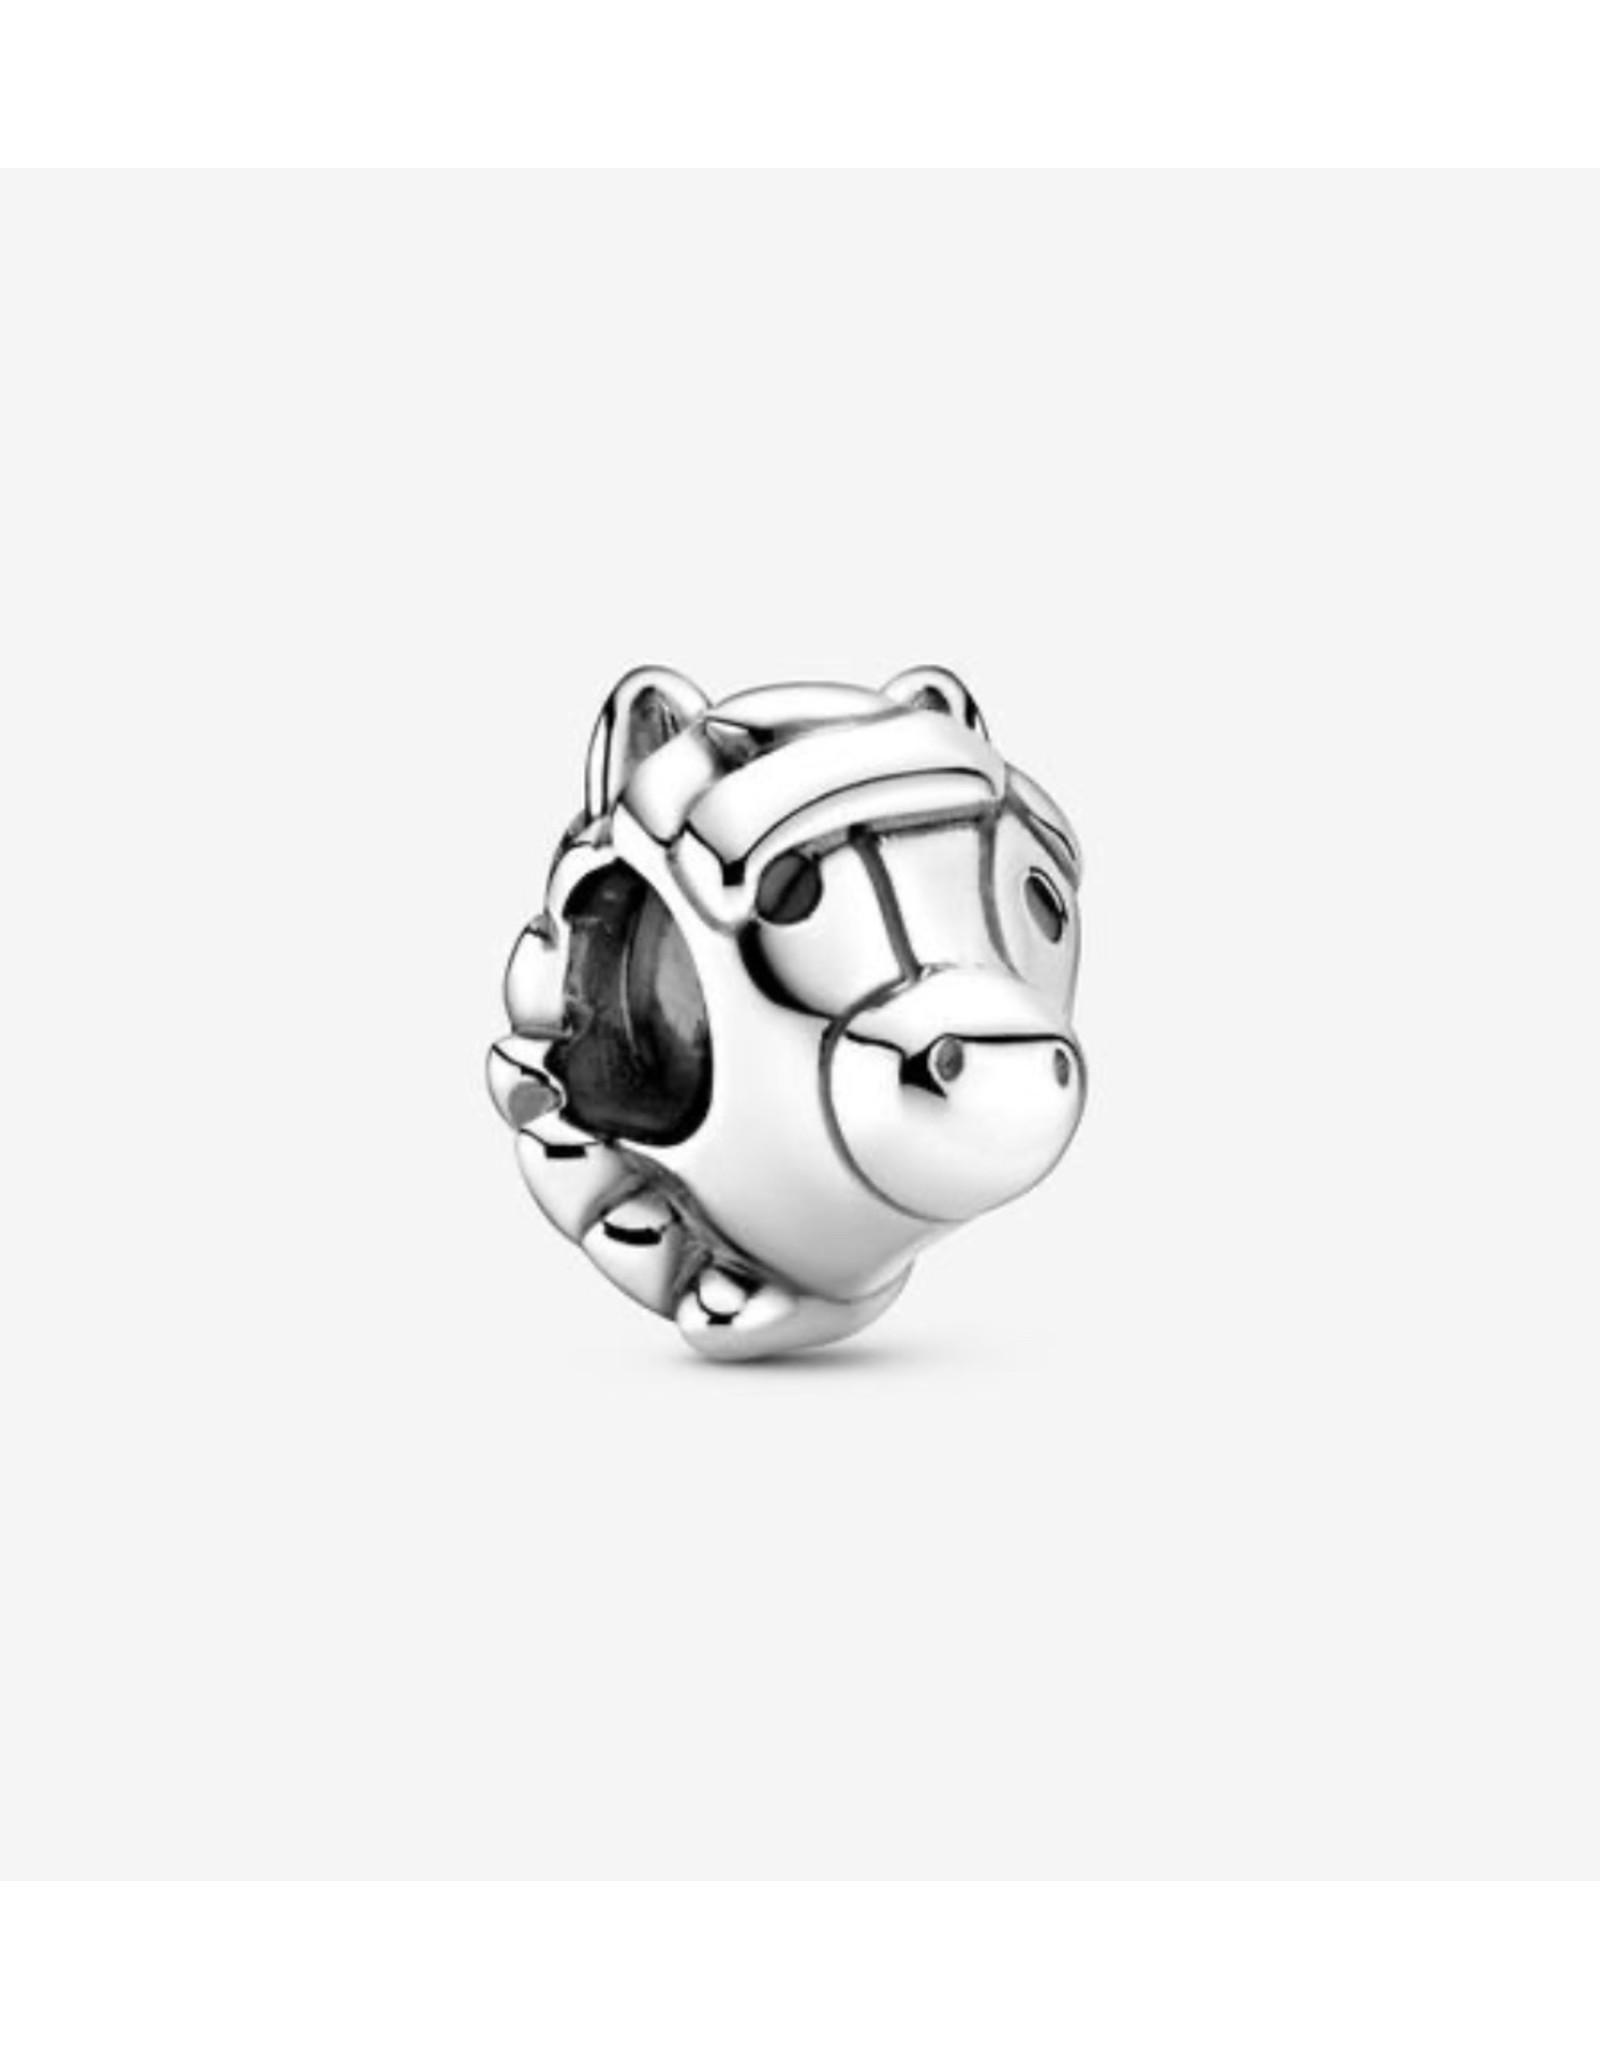 Pandora Pandora Charm,799074C01, Horse, Sterling Silver, Black Enamel